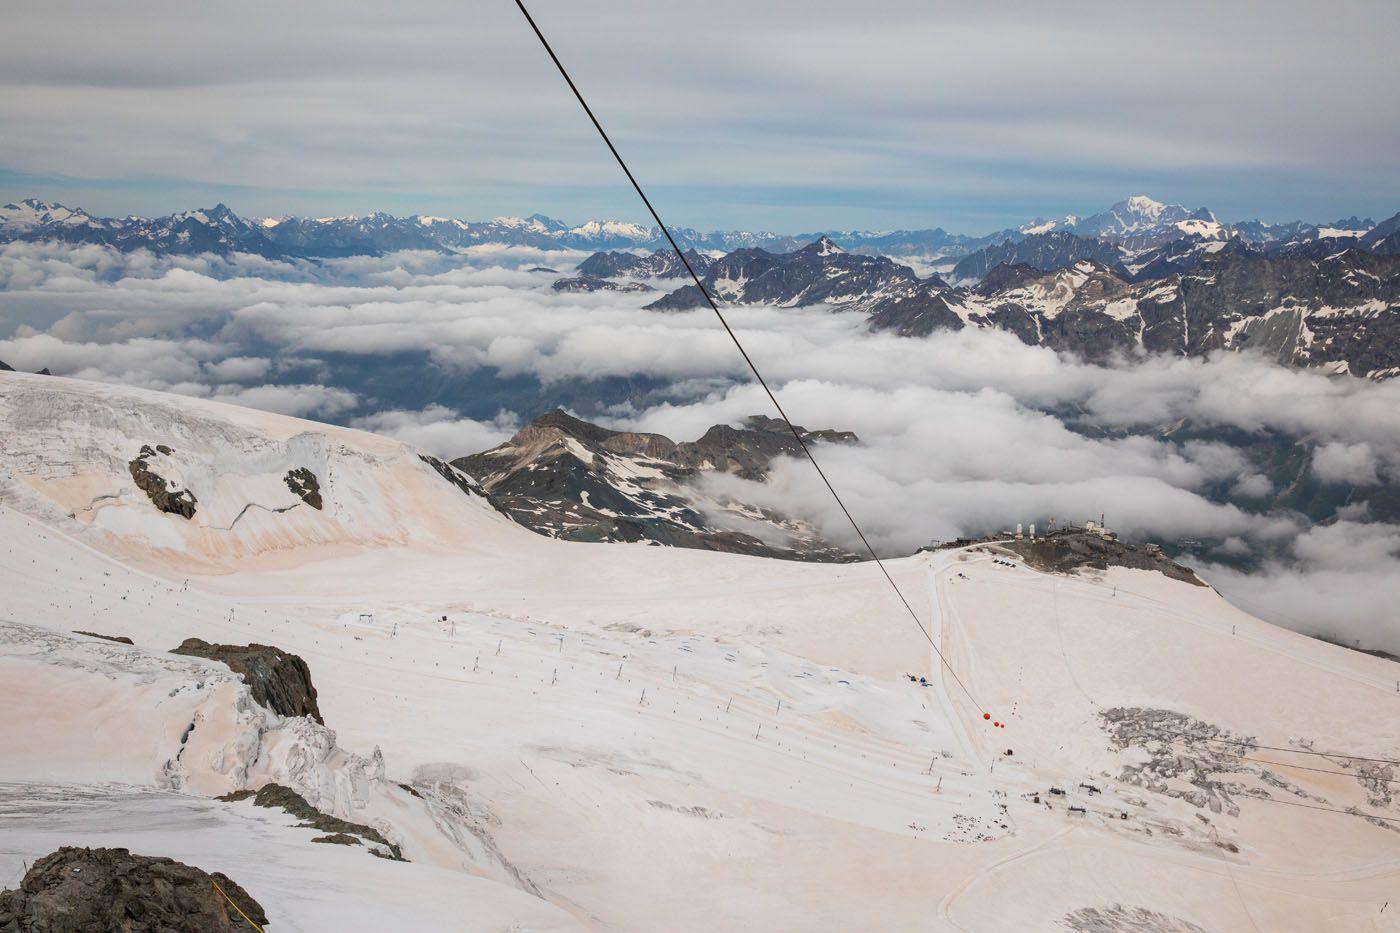 More Ski Slopes